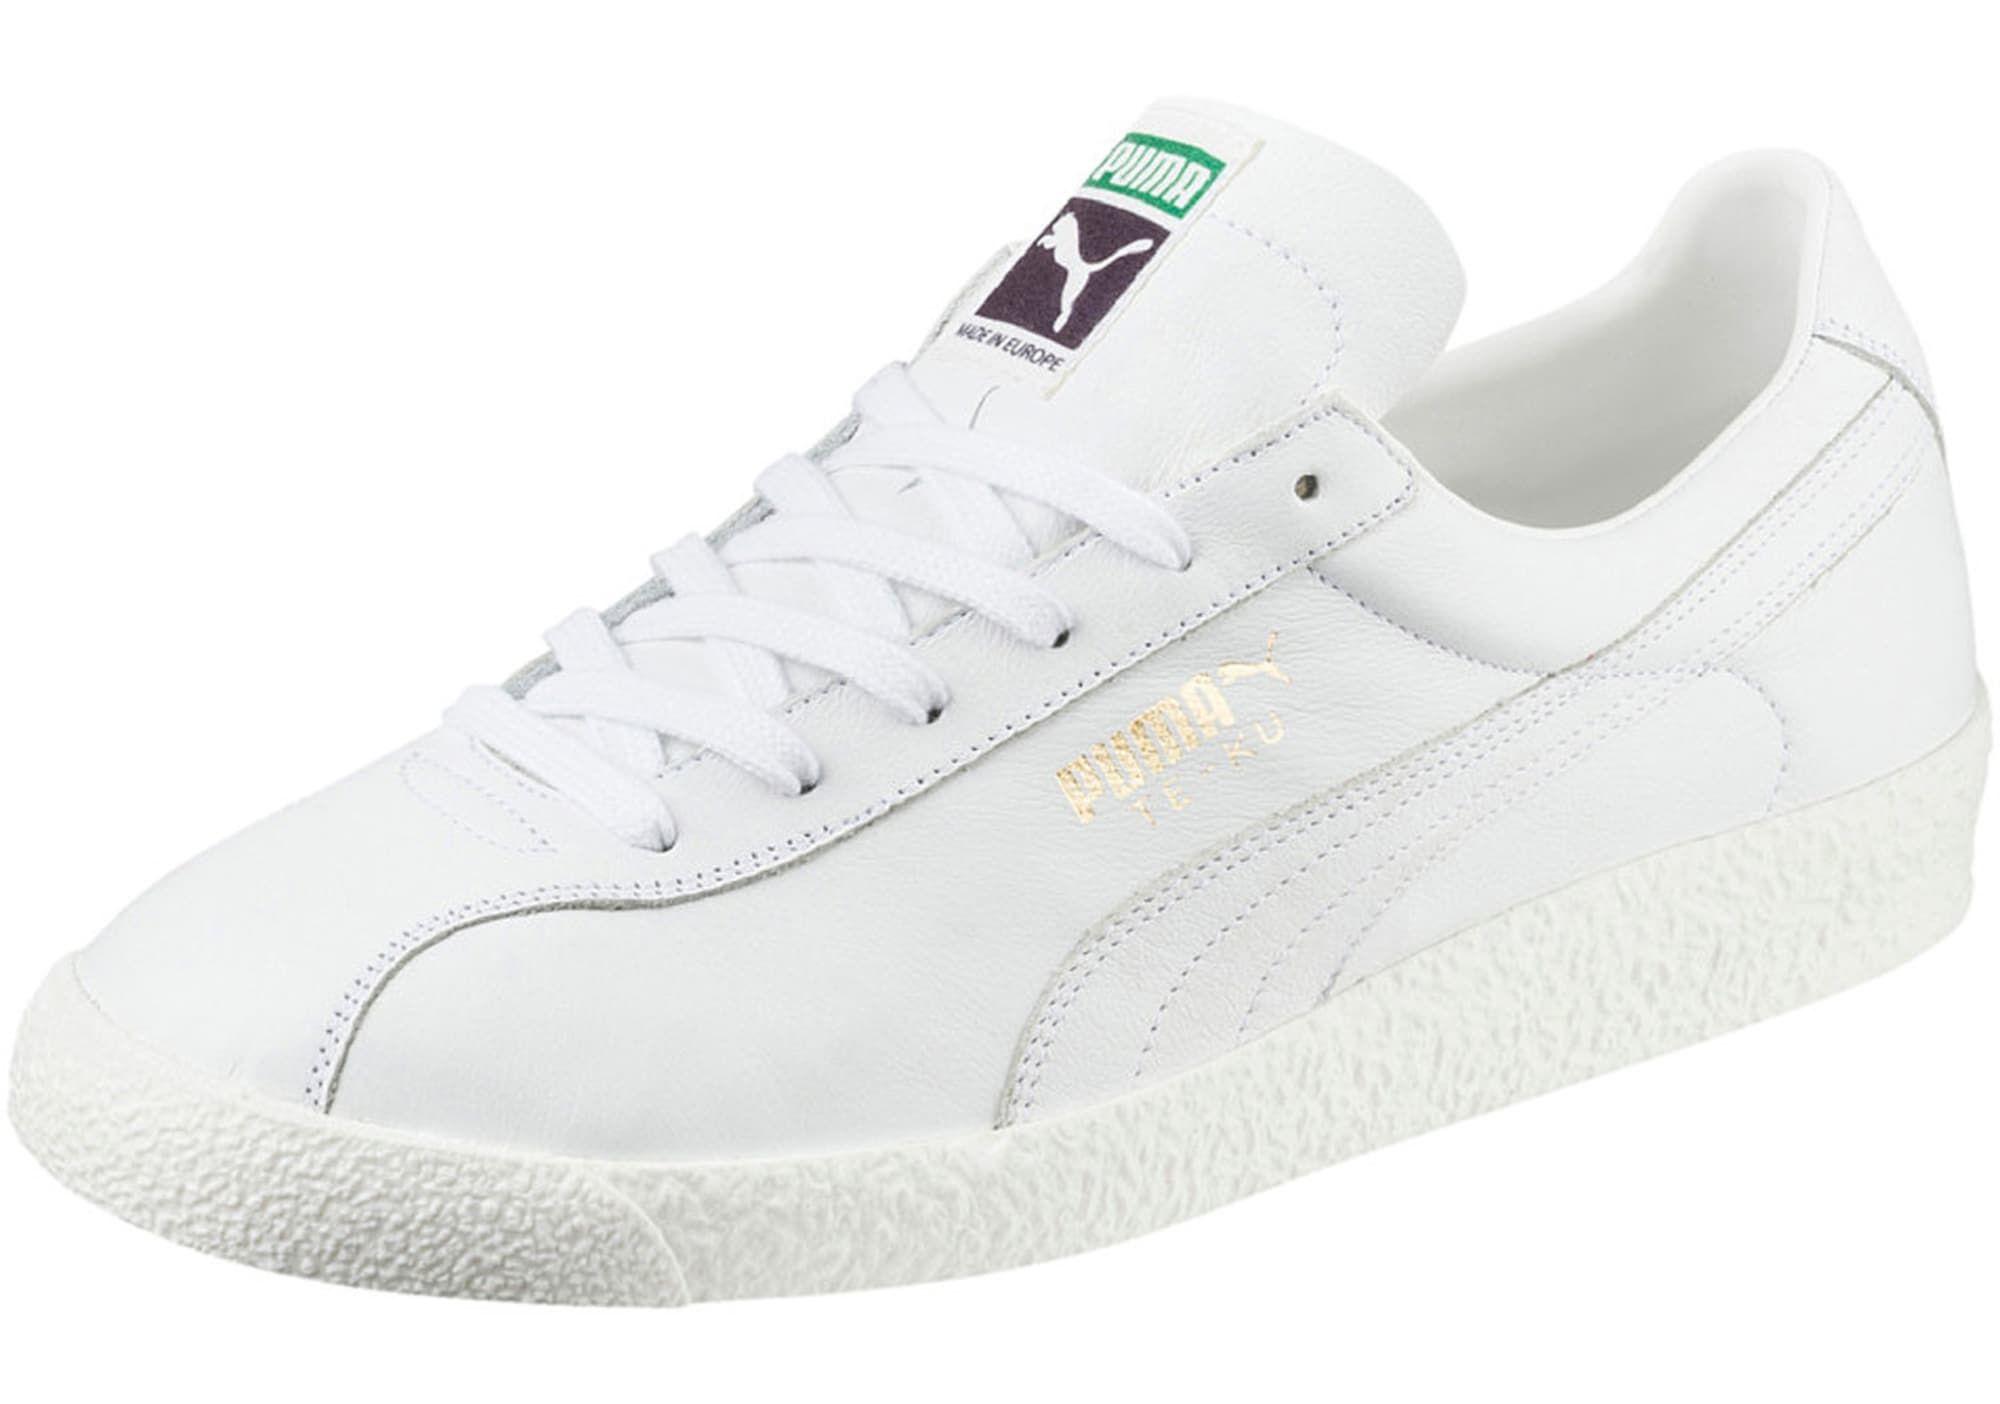 Ku Puma WeißKategorie Herren Te Core Sneaker qVpUSzM